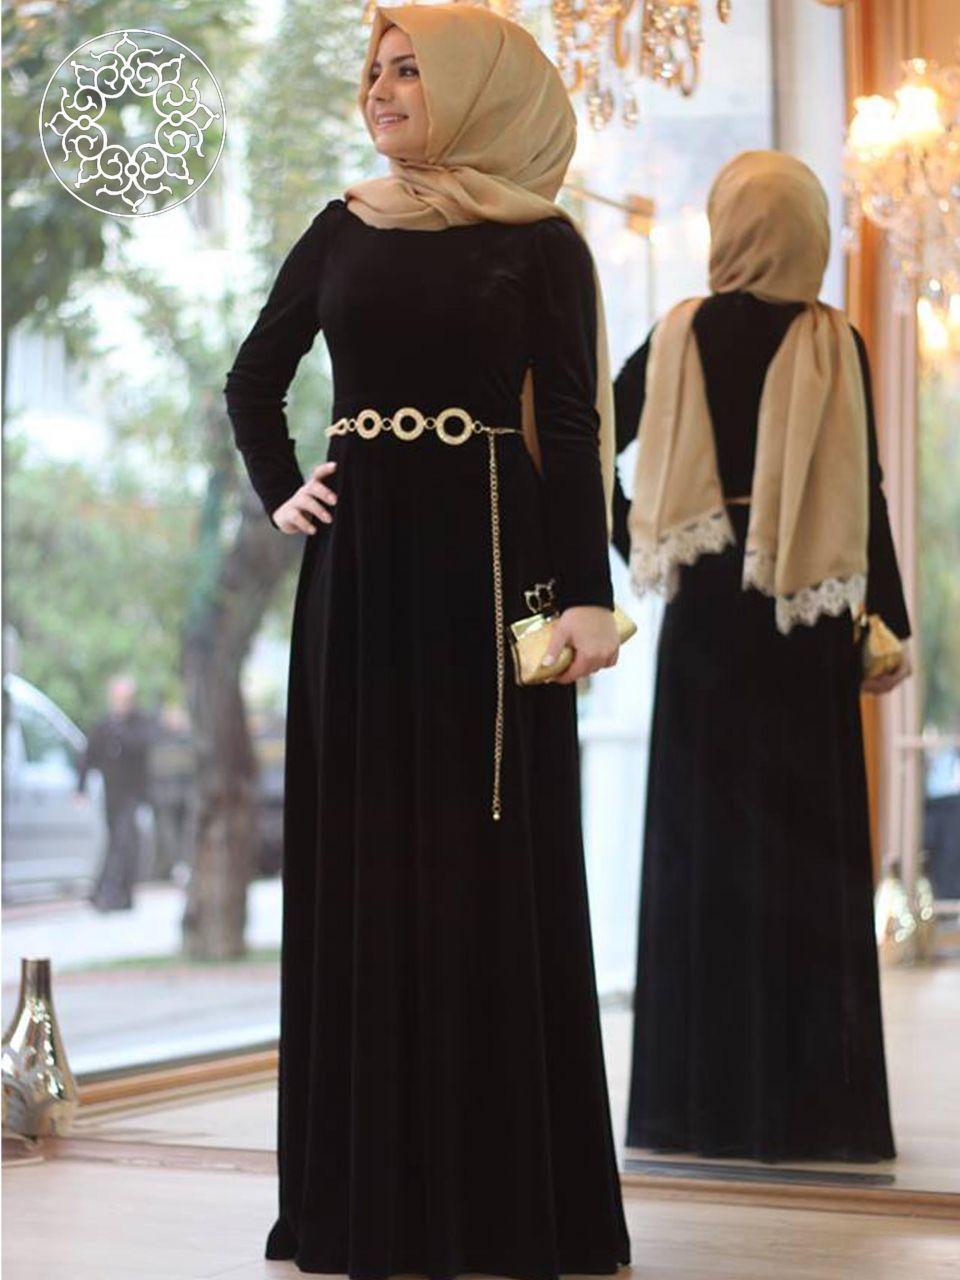 Pin by biya kashaf on dresses pinterest abayas hijab outfit and